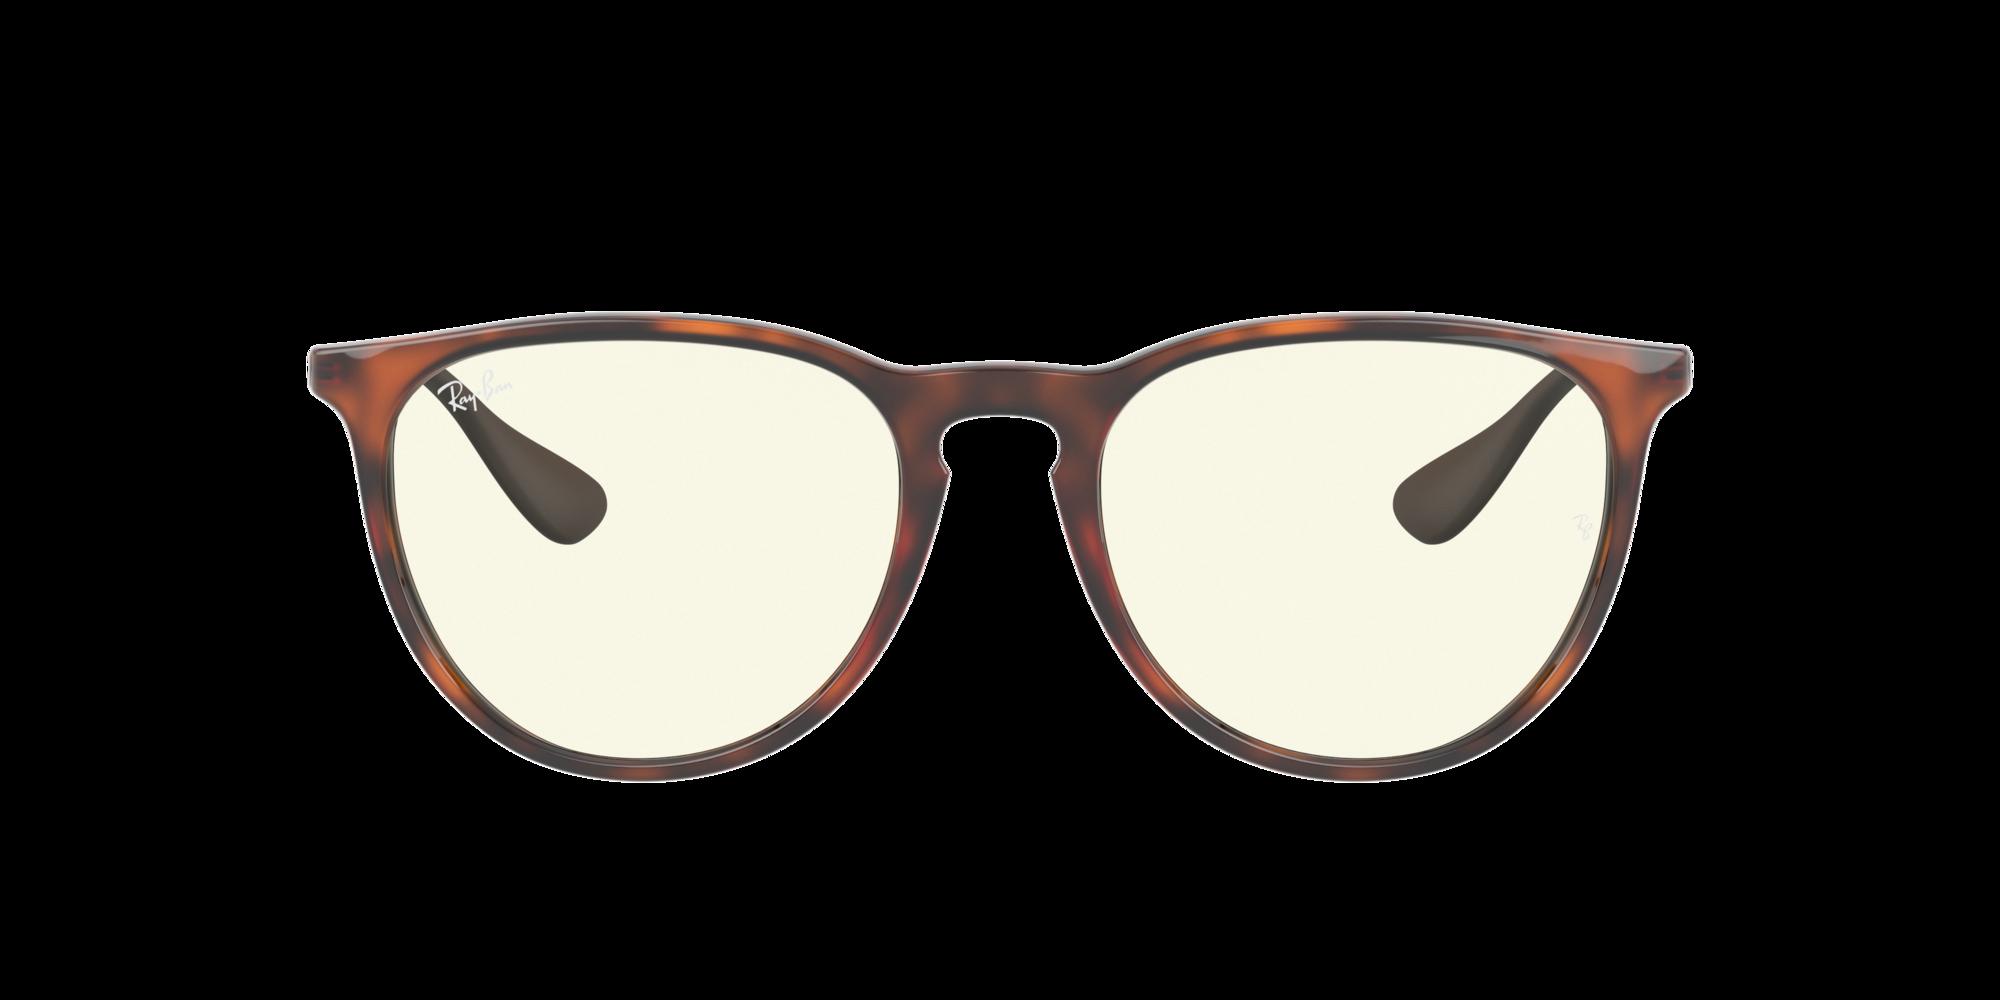 Image for RB4171 54 ERIKA from LensCrafters | Glasses, Prescription Glasses Online, Eyewear